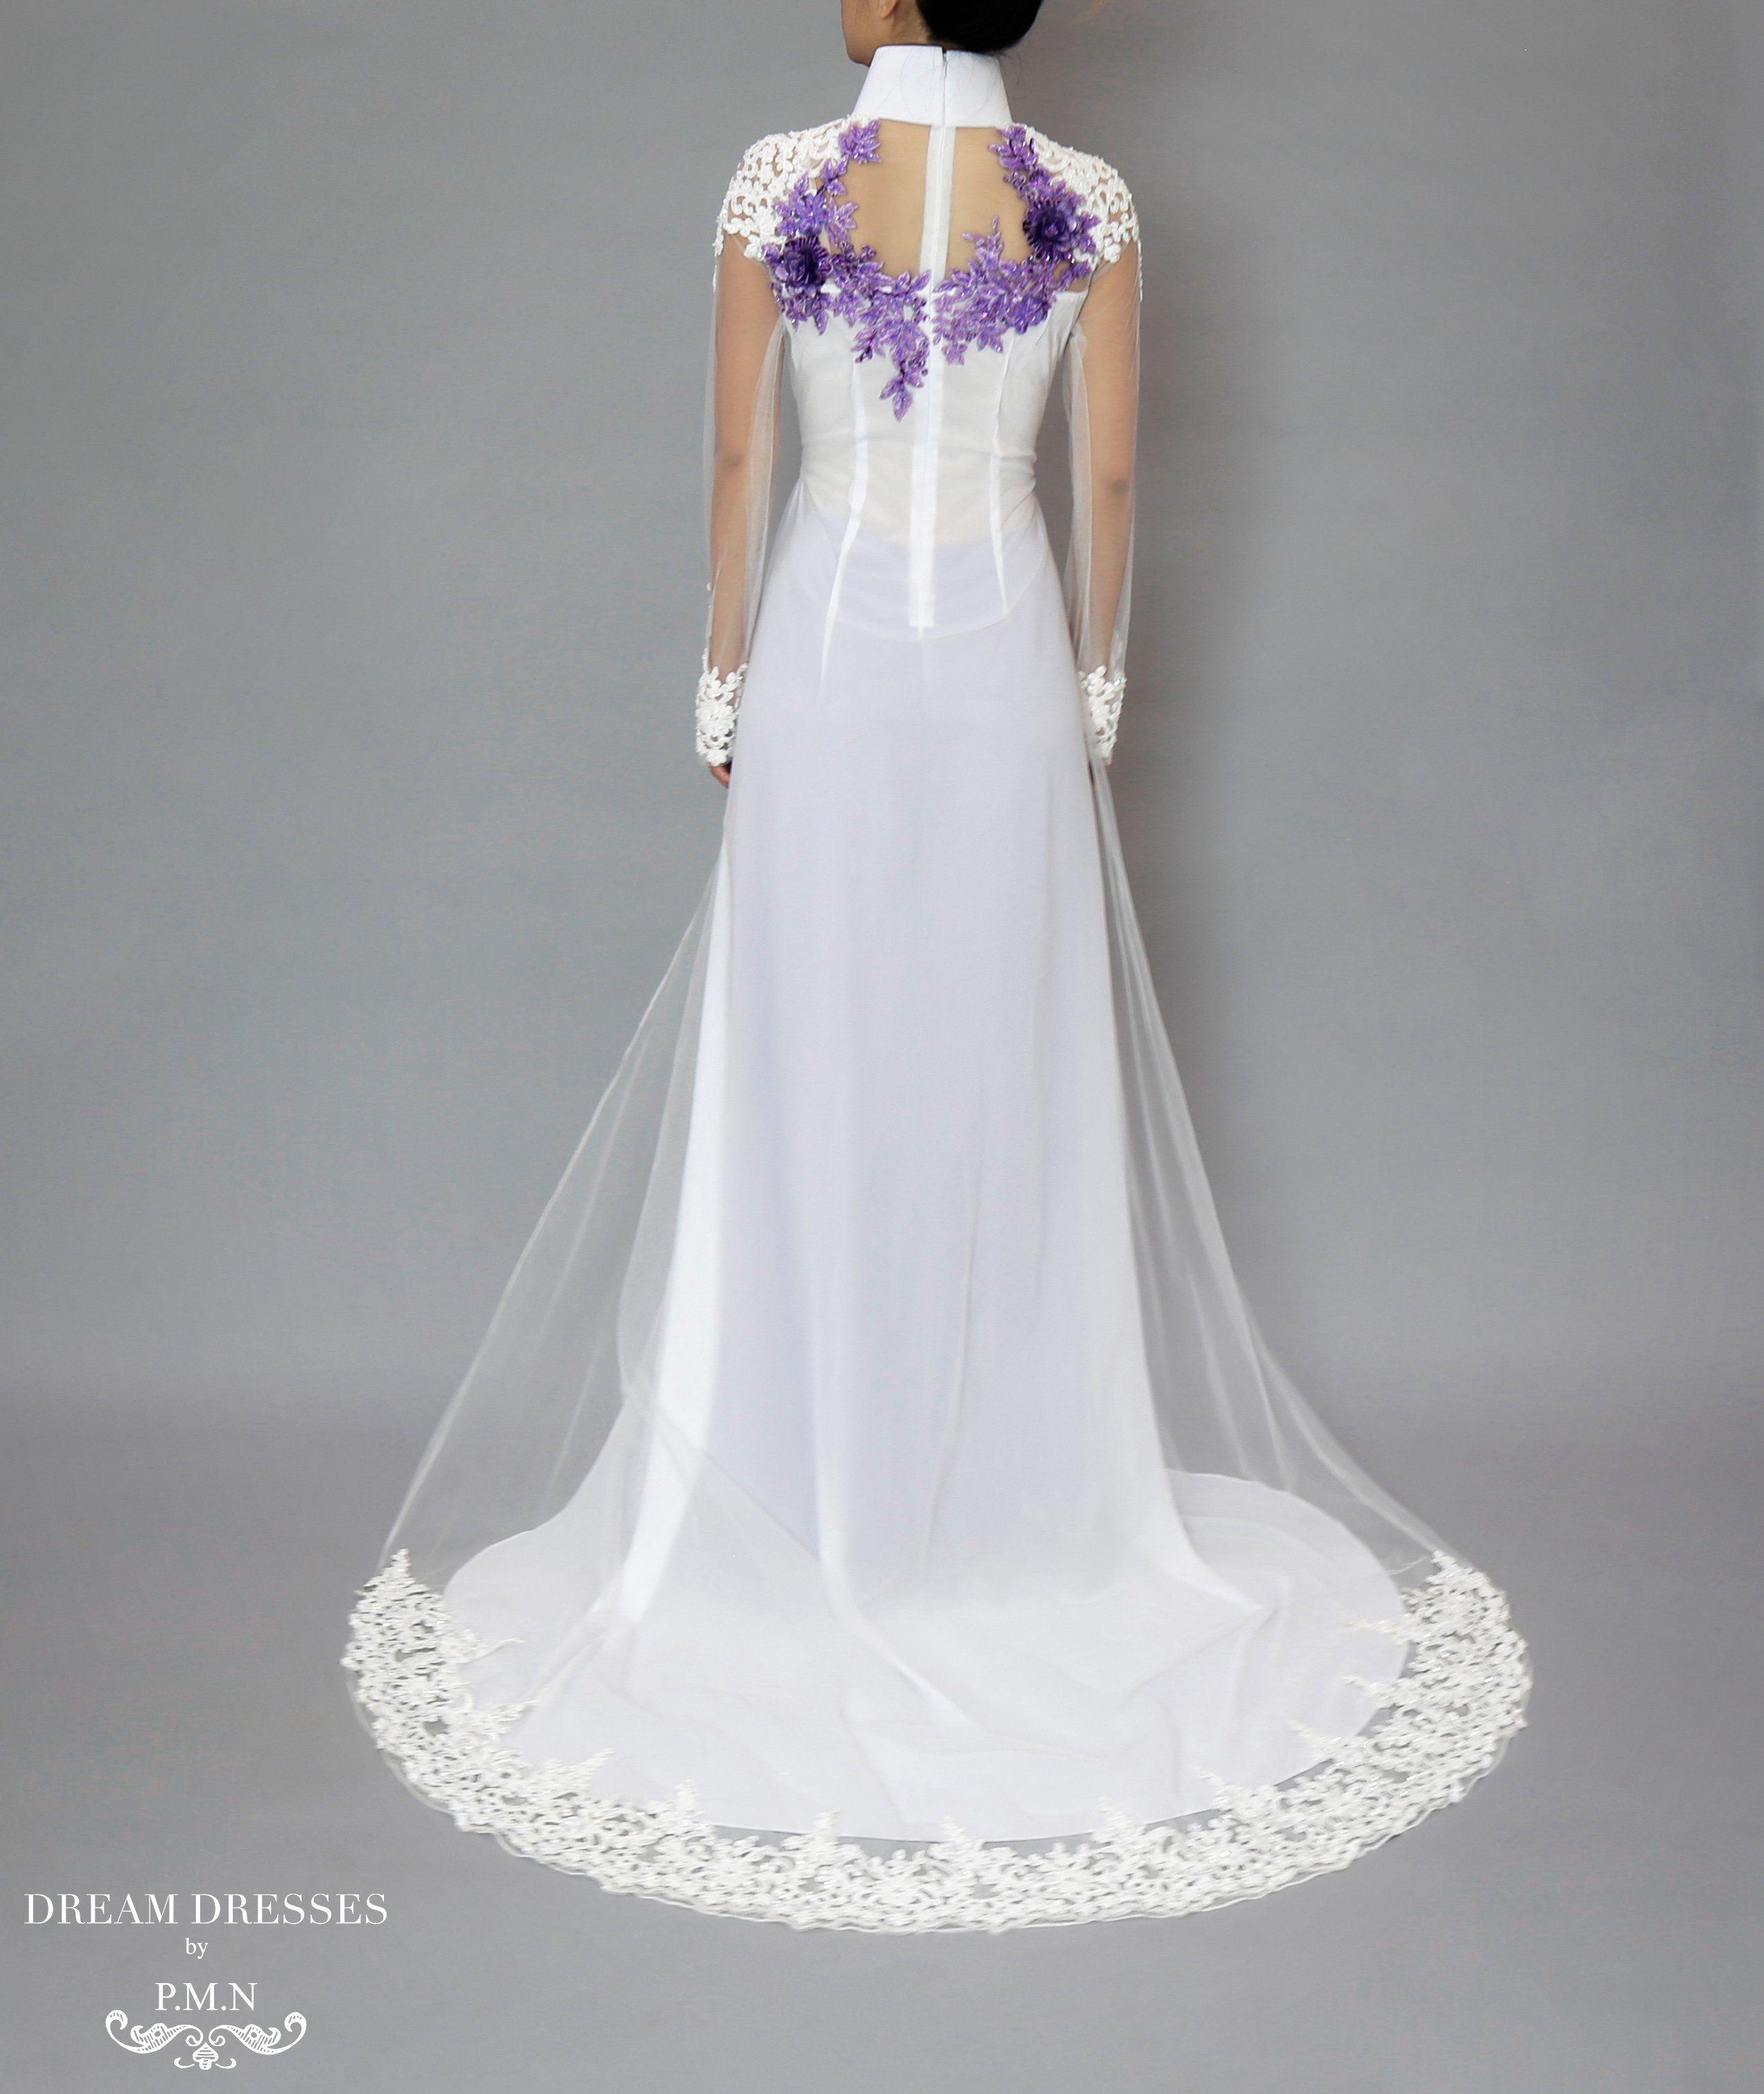 Traditional Wedding Dresses Beaded Lace Dream Dress Custom Made Funny Pics: Funny Purple Wedding Dress At Websimilar.org